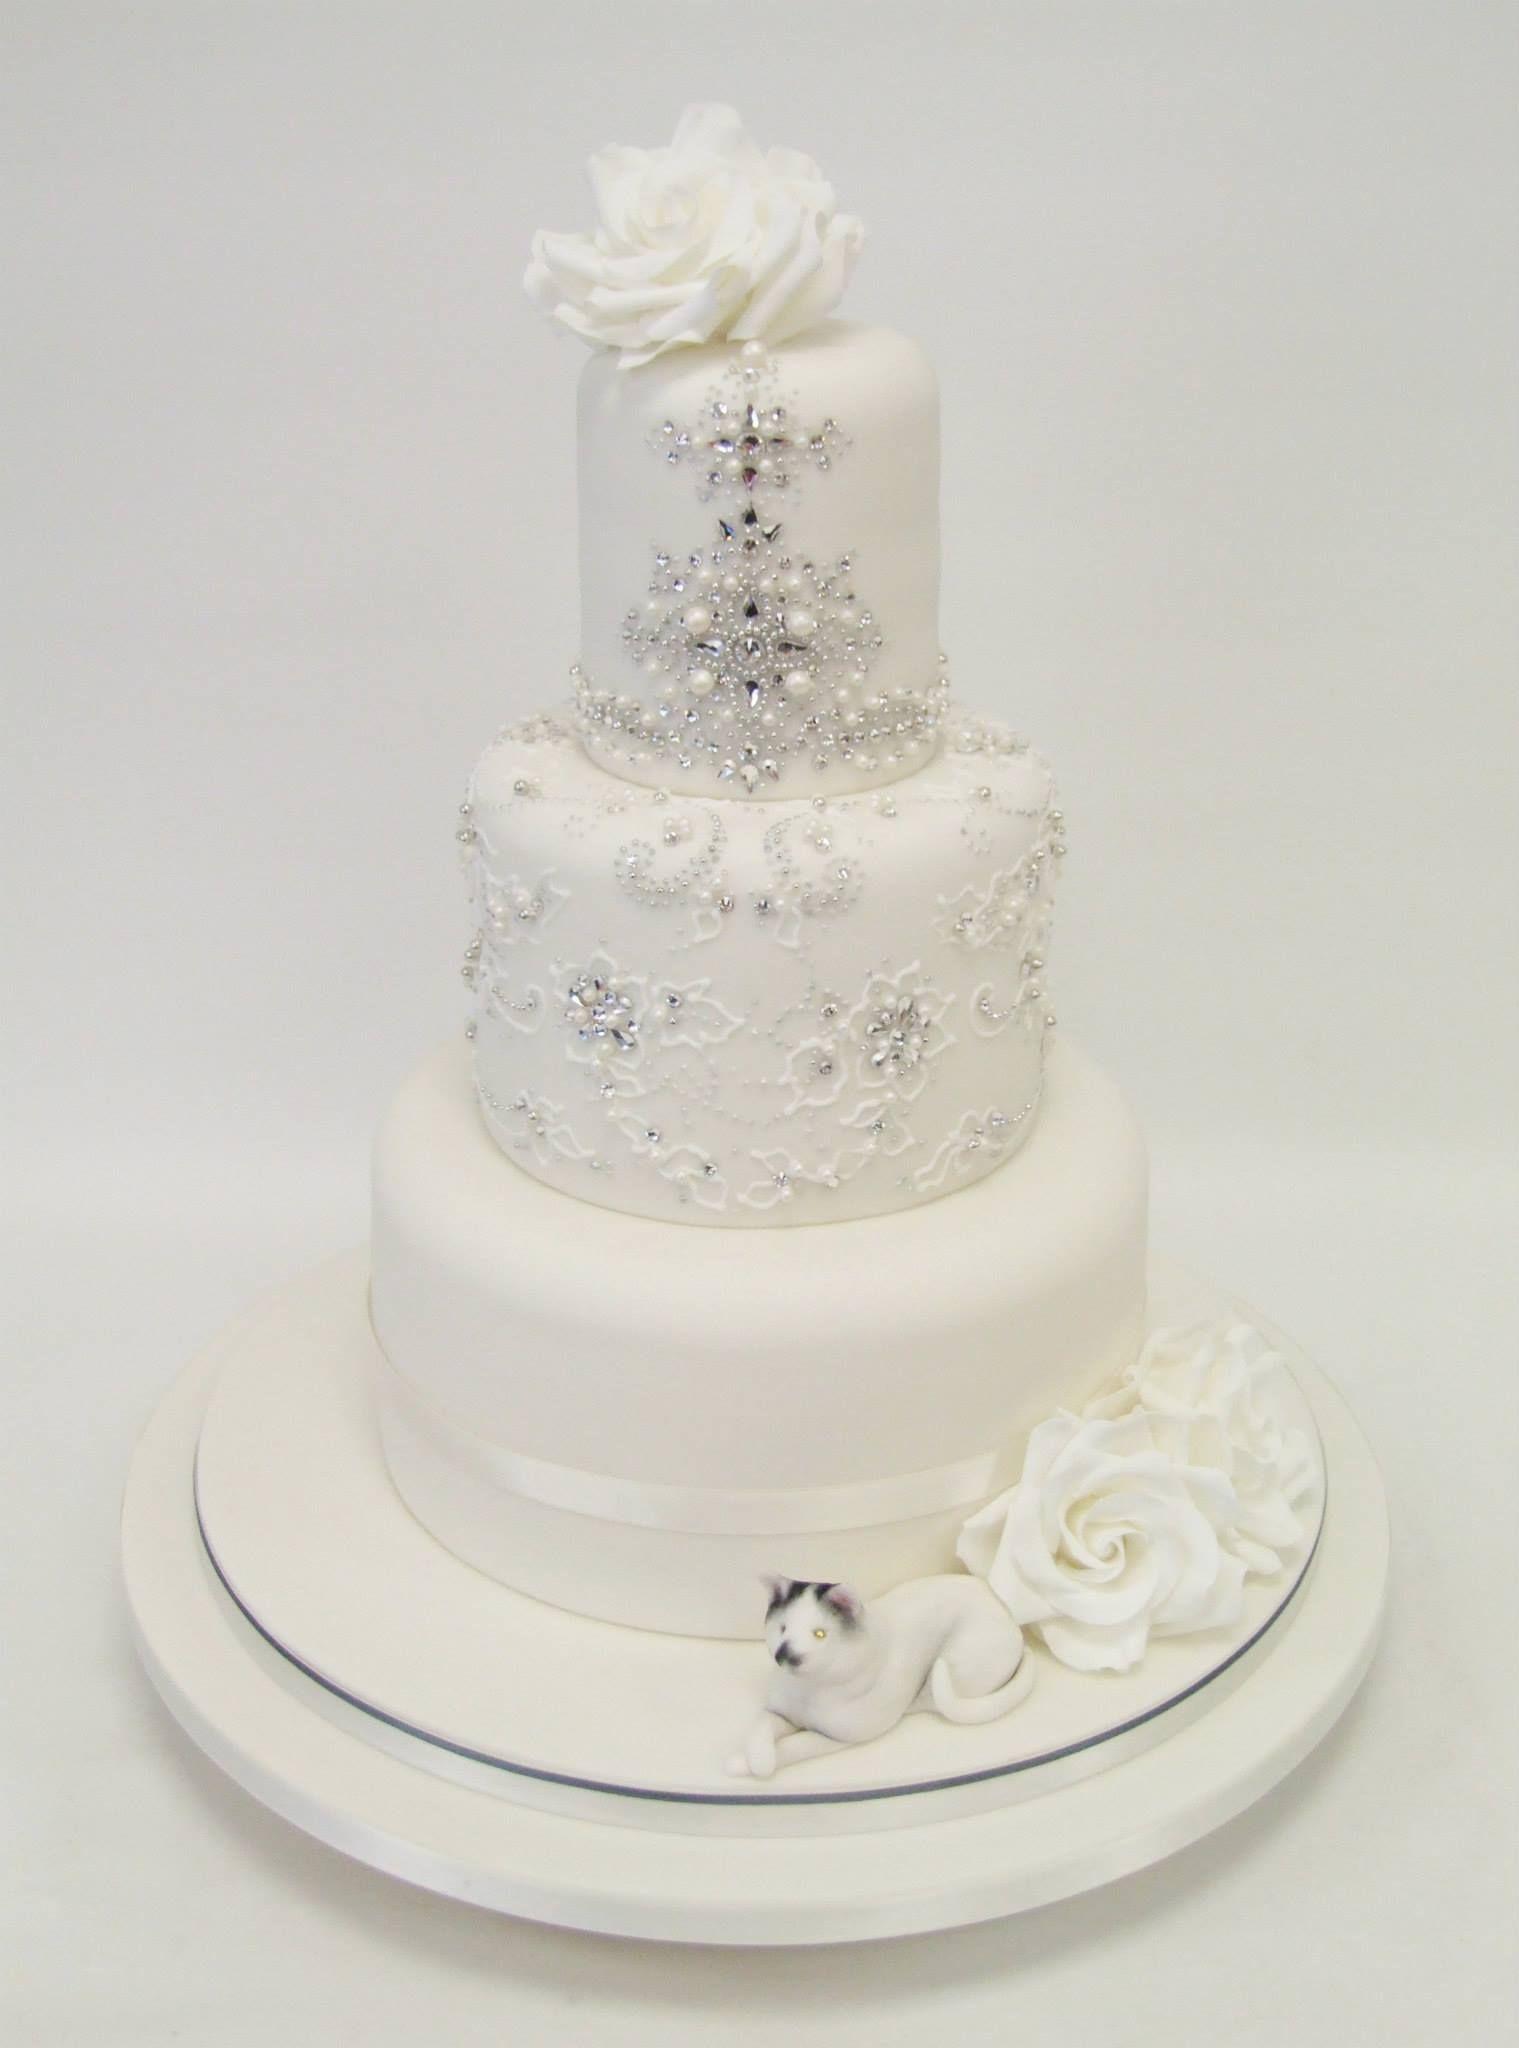 Emma Jayne Cake Design | White cakes | Pinterest | White cakes and ...